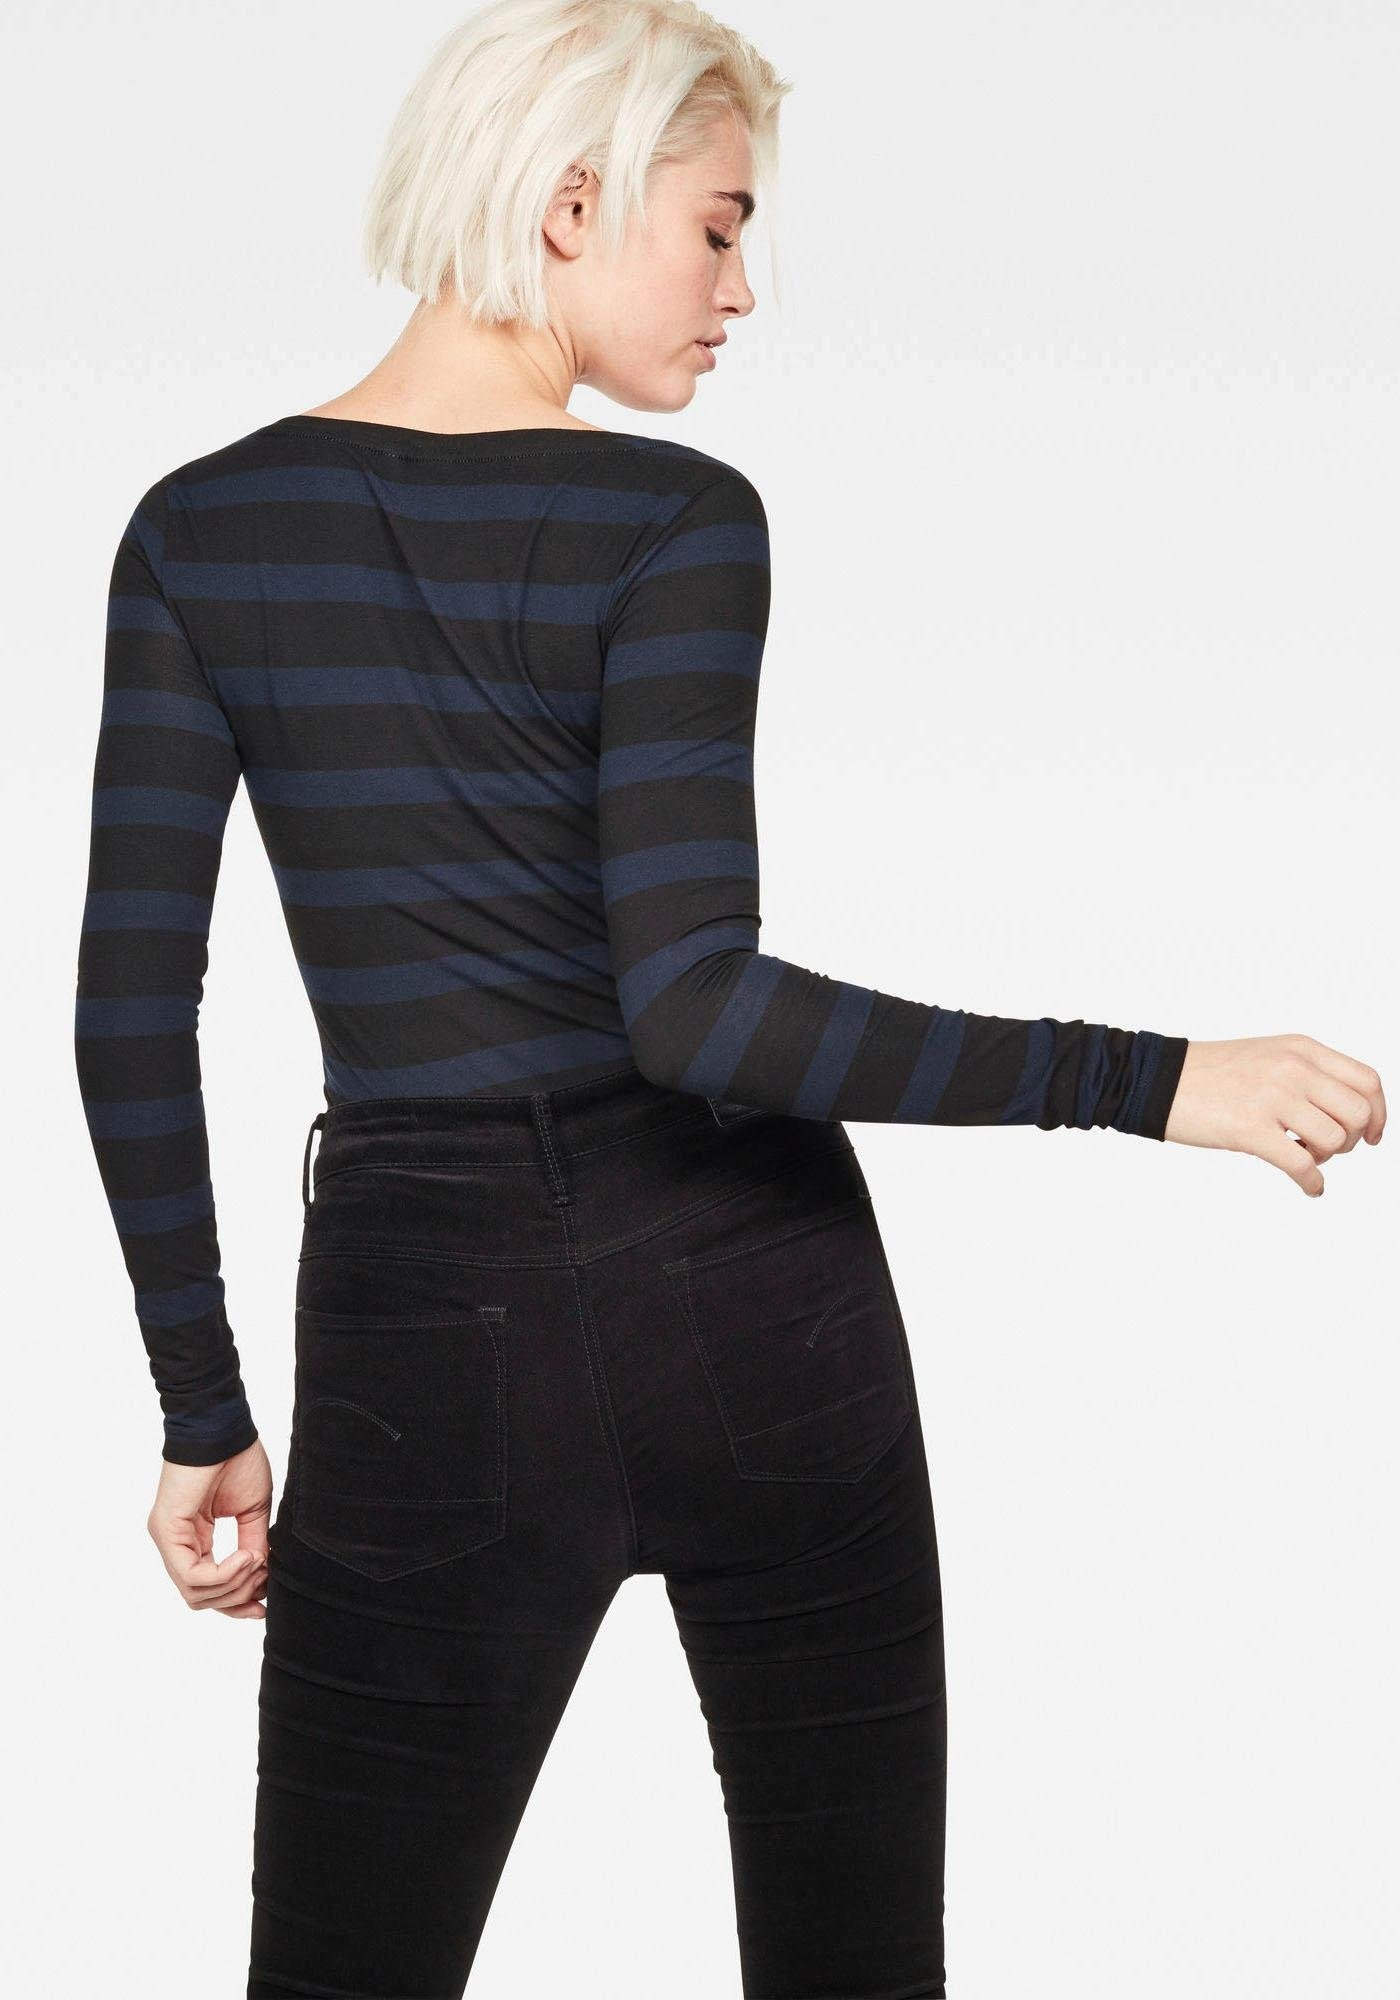 G De Met R Wmn T Online Shop L Lange Stripe Mouwenbase star Raw S Shirt sIn wkO8nP0X